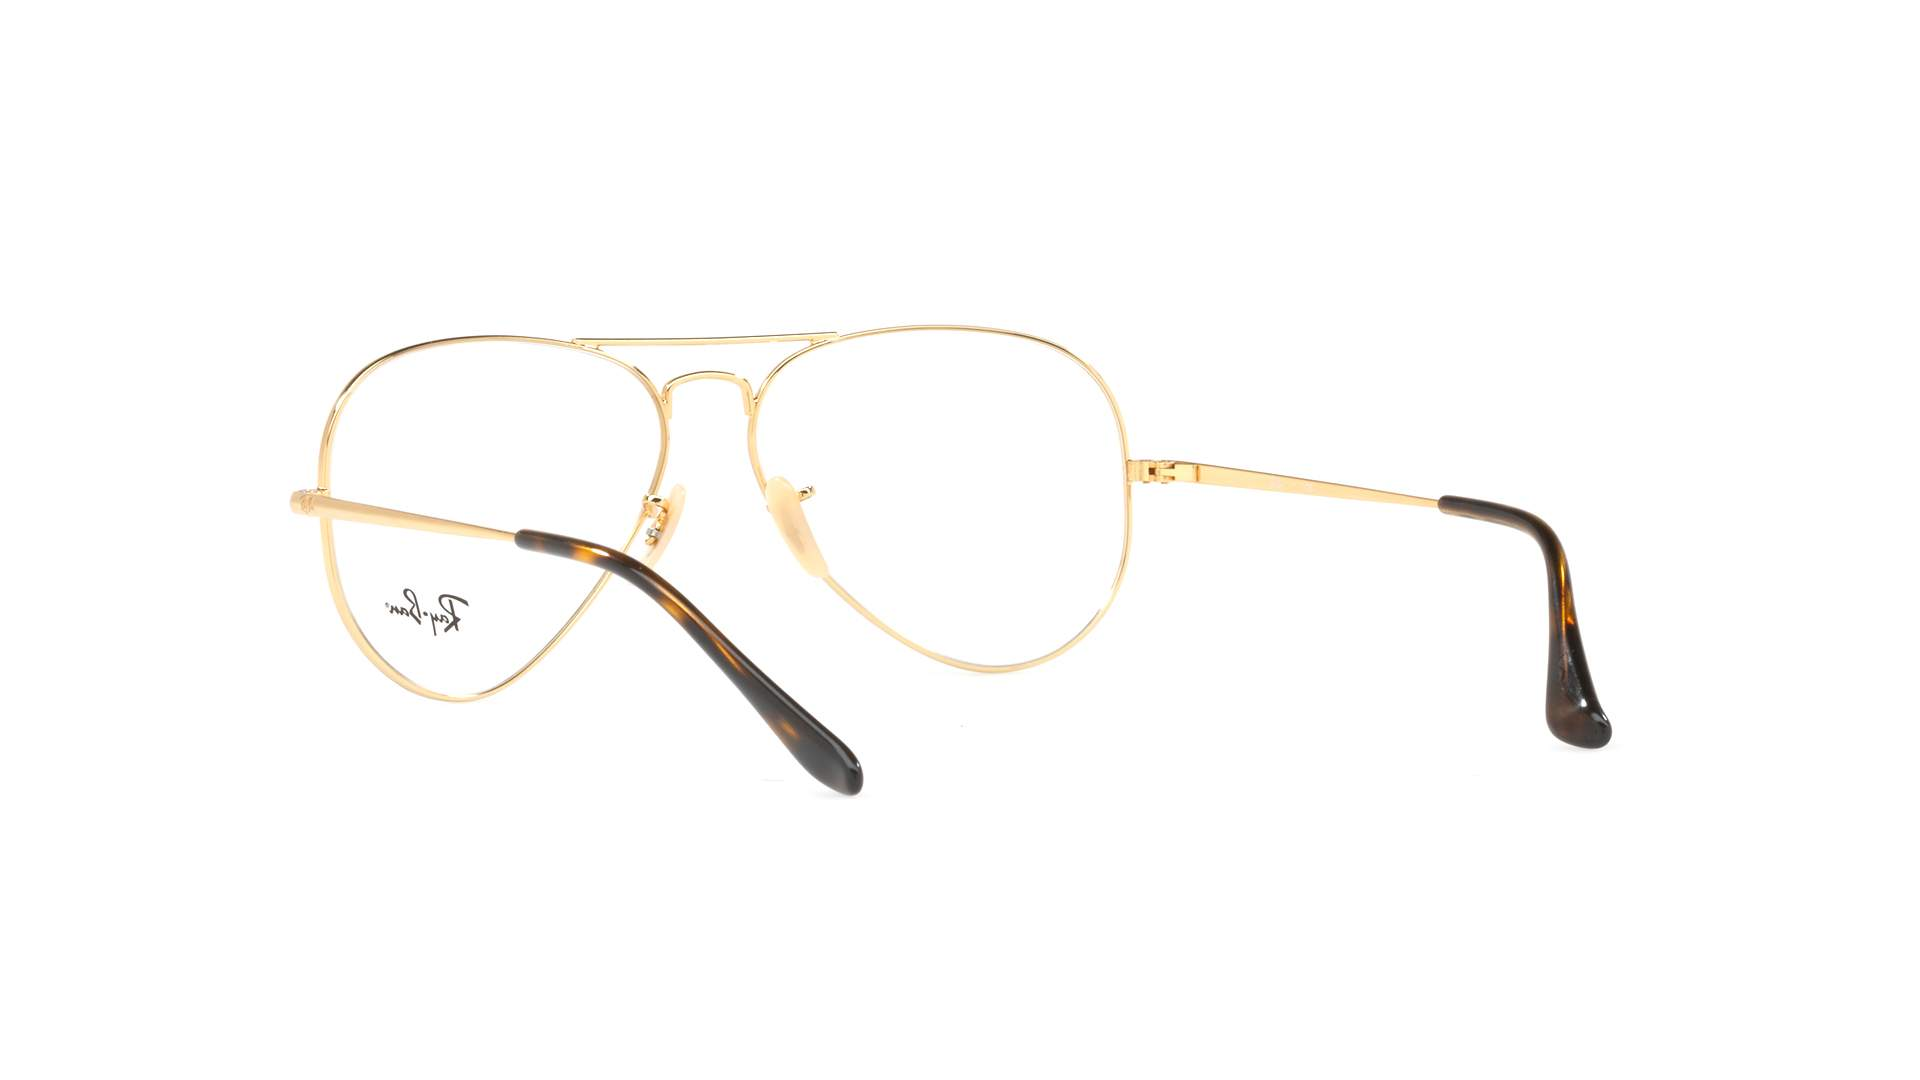 2992a5d536844 Eyeglasses Ray-Ban Aviator Optics Gold RX6489 RB6489 2945 55-14 Medium